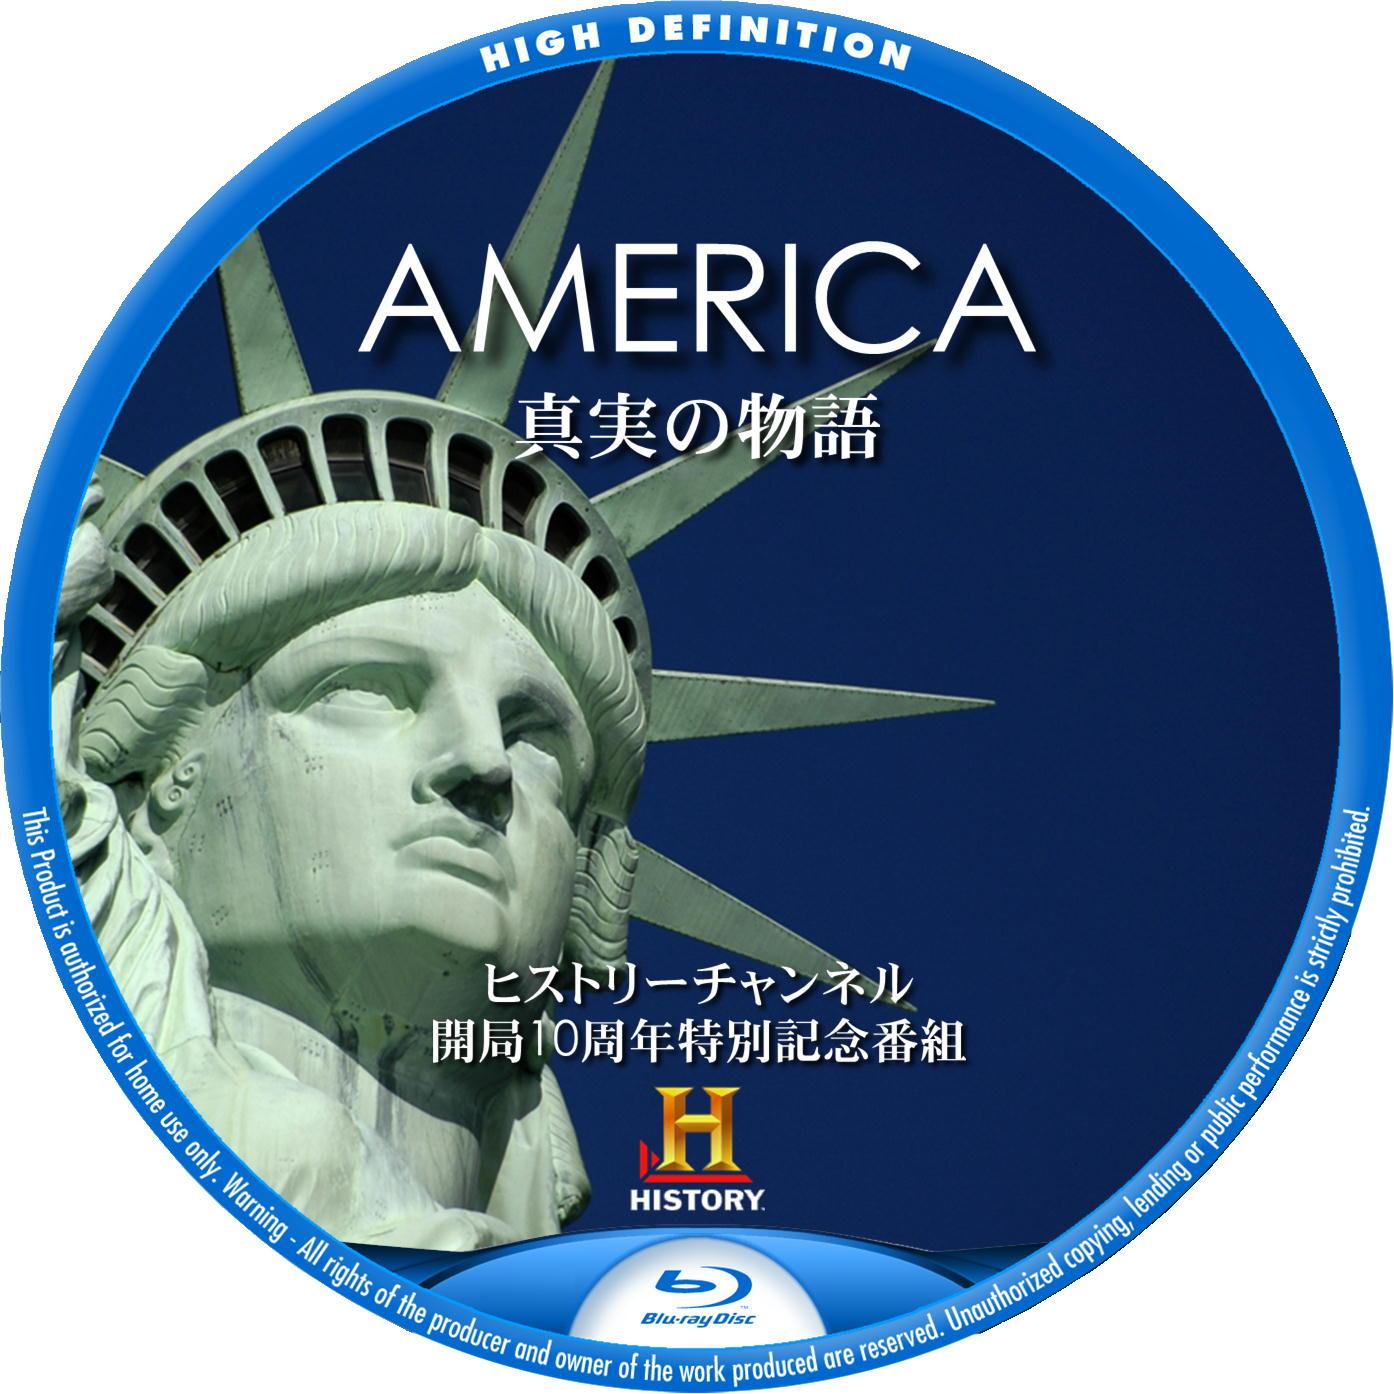 AMERICA 真実の物語 Blu-rayラベル